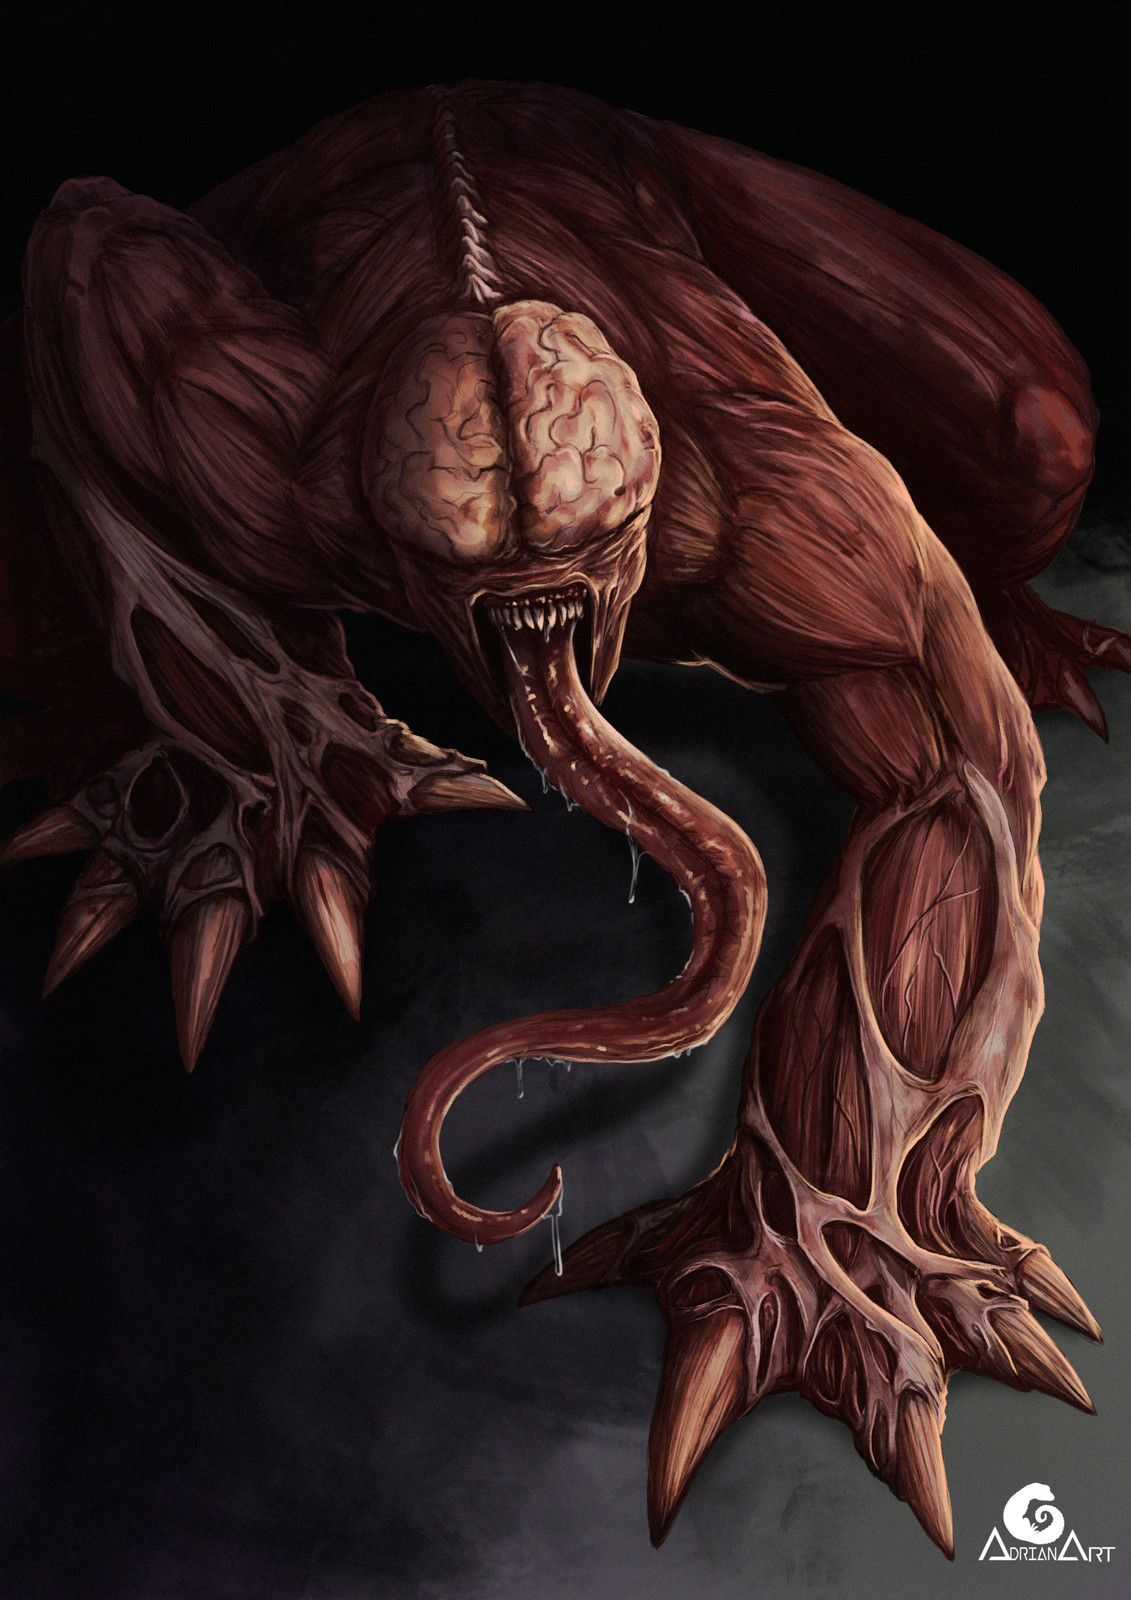 Licker Resident Evil By Adrianart Re2